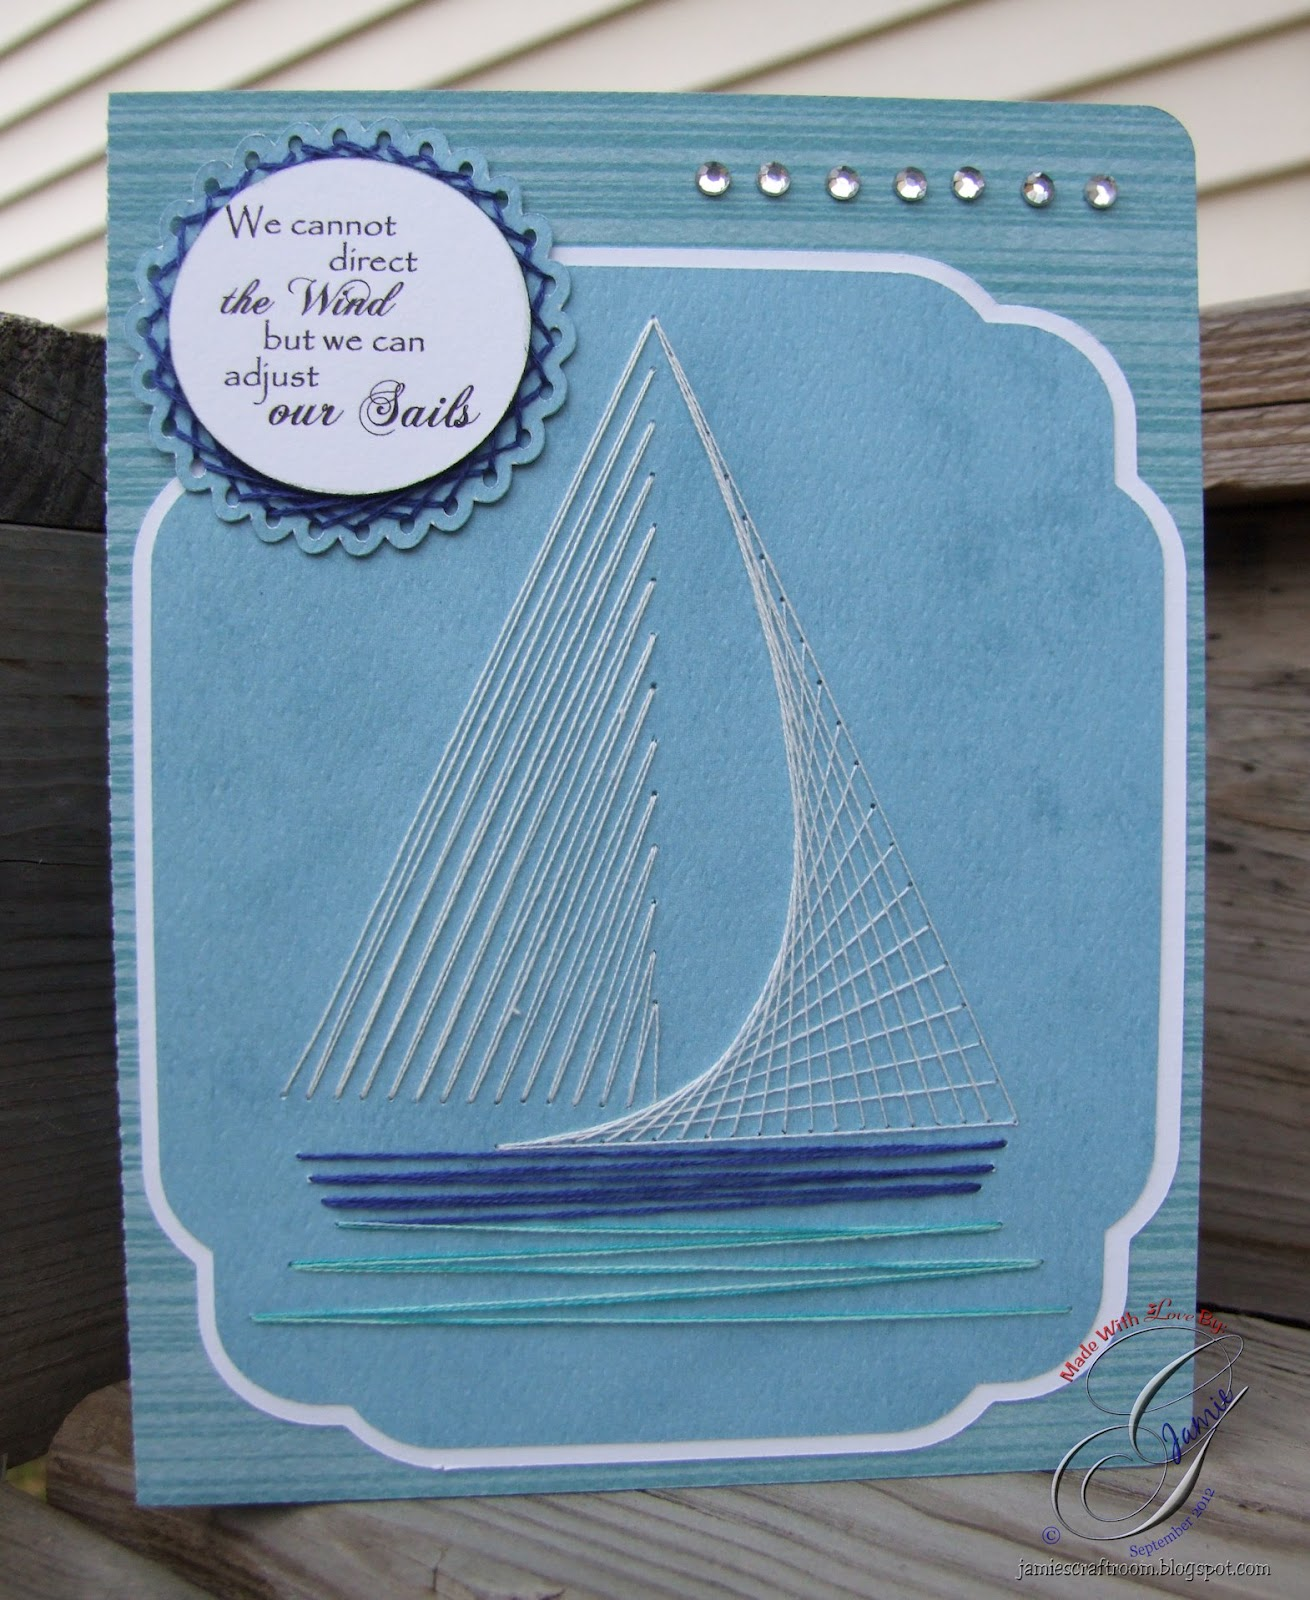 Jamies Craft Room String Art Anniversary Card